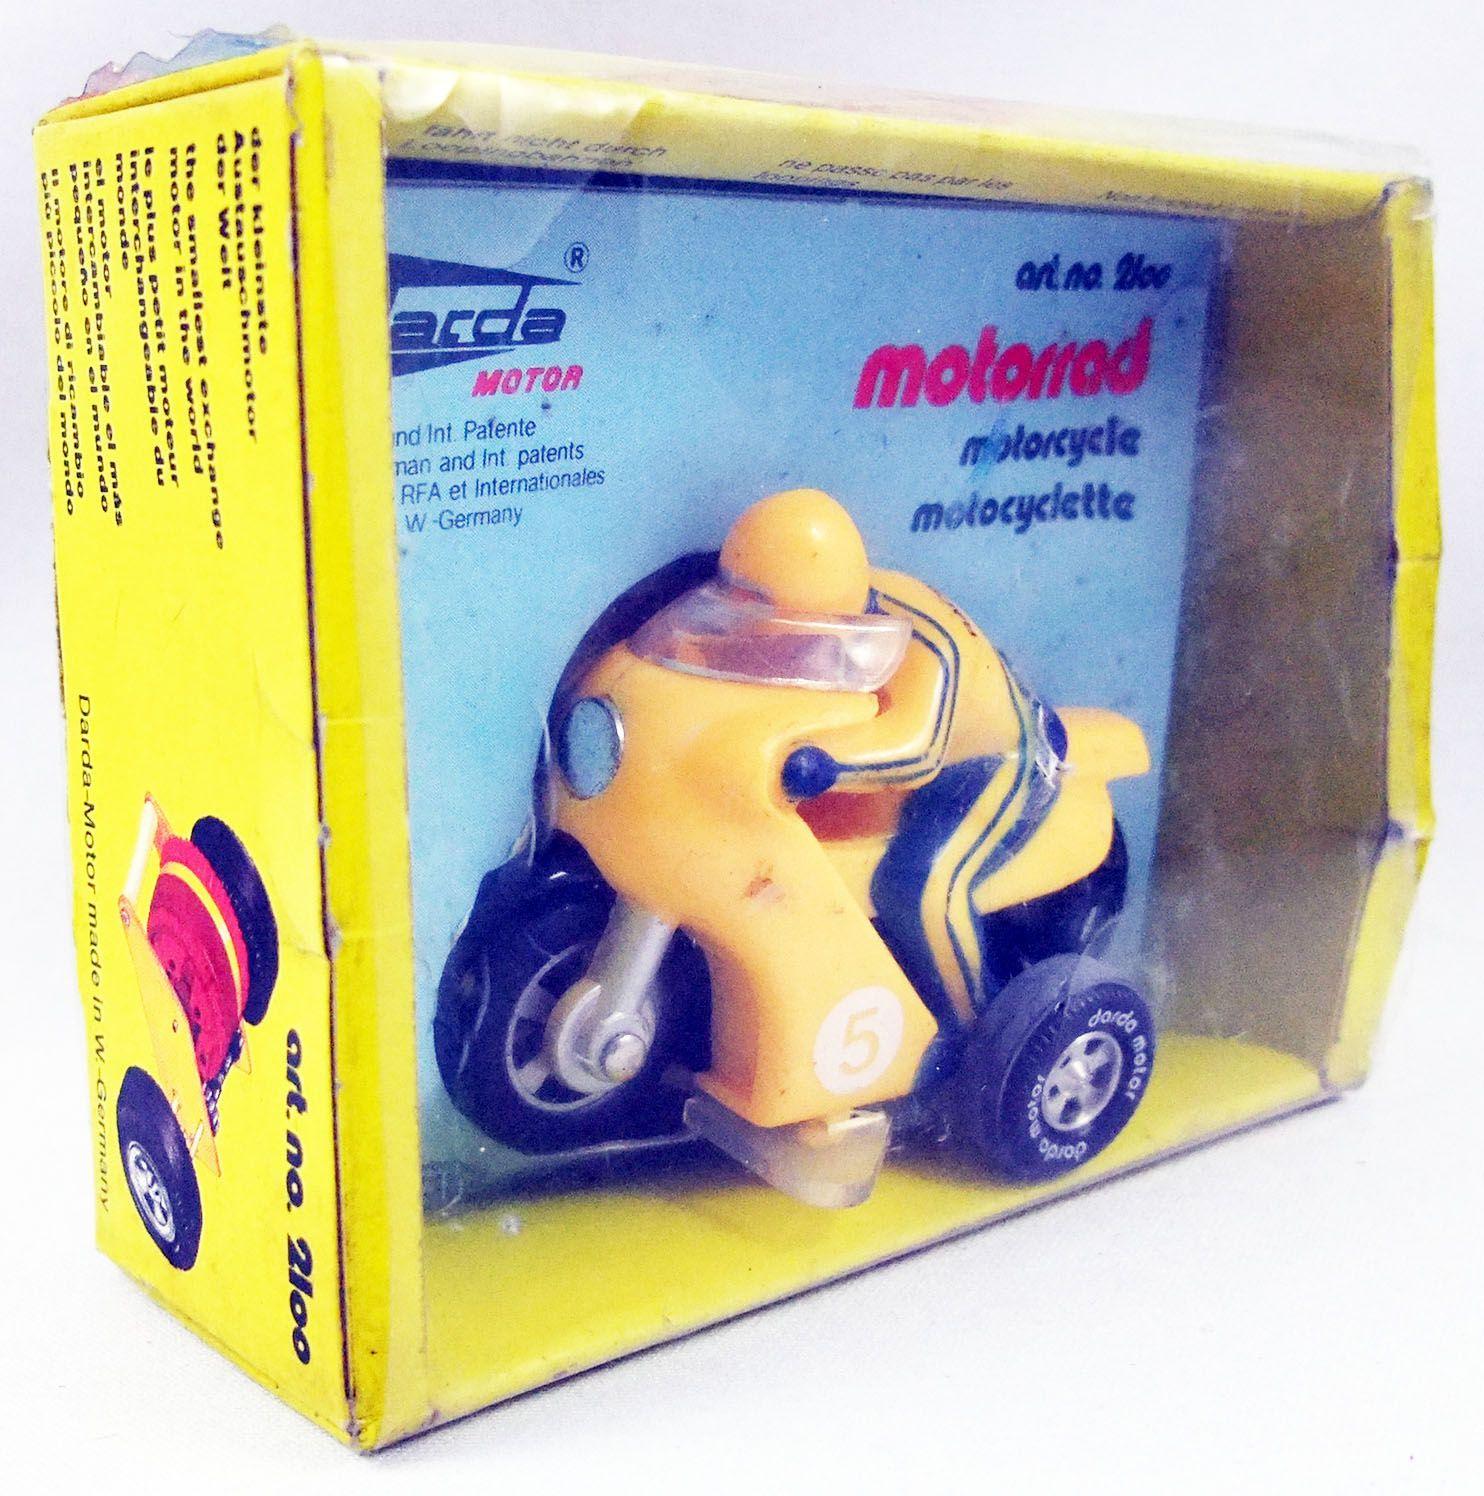 Darda Motor - Motocyclette jaune n°2100